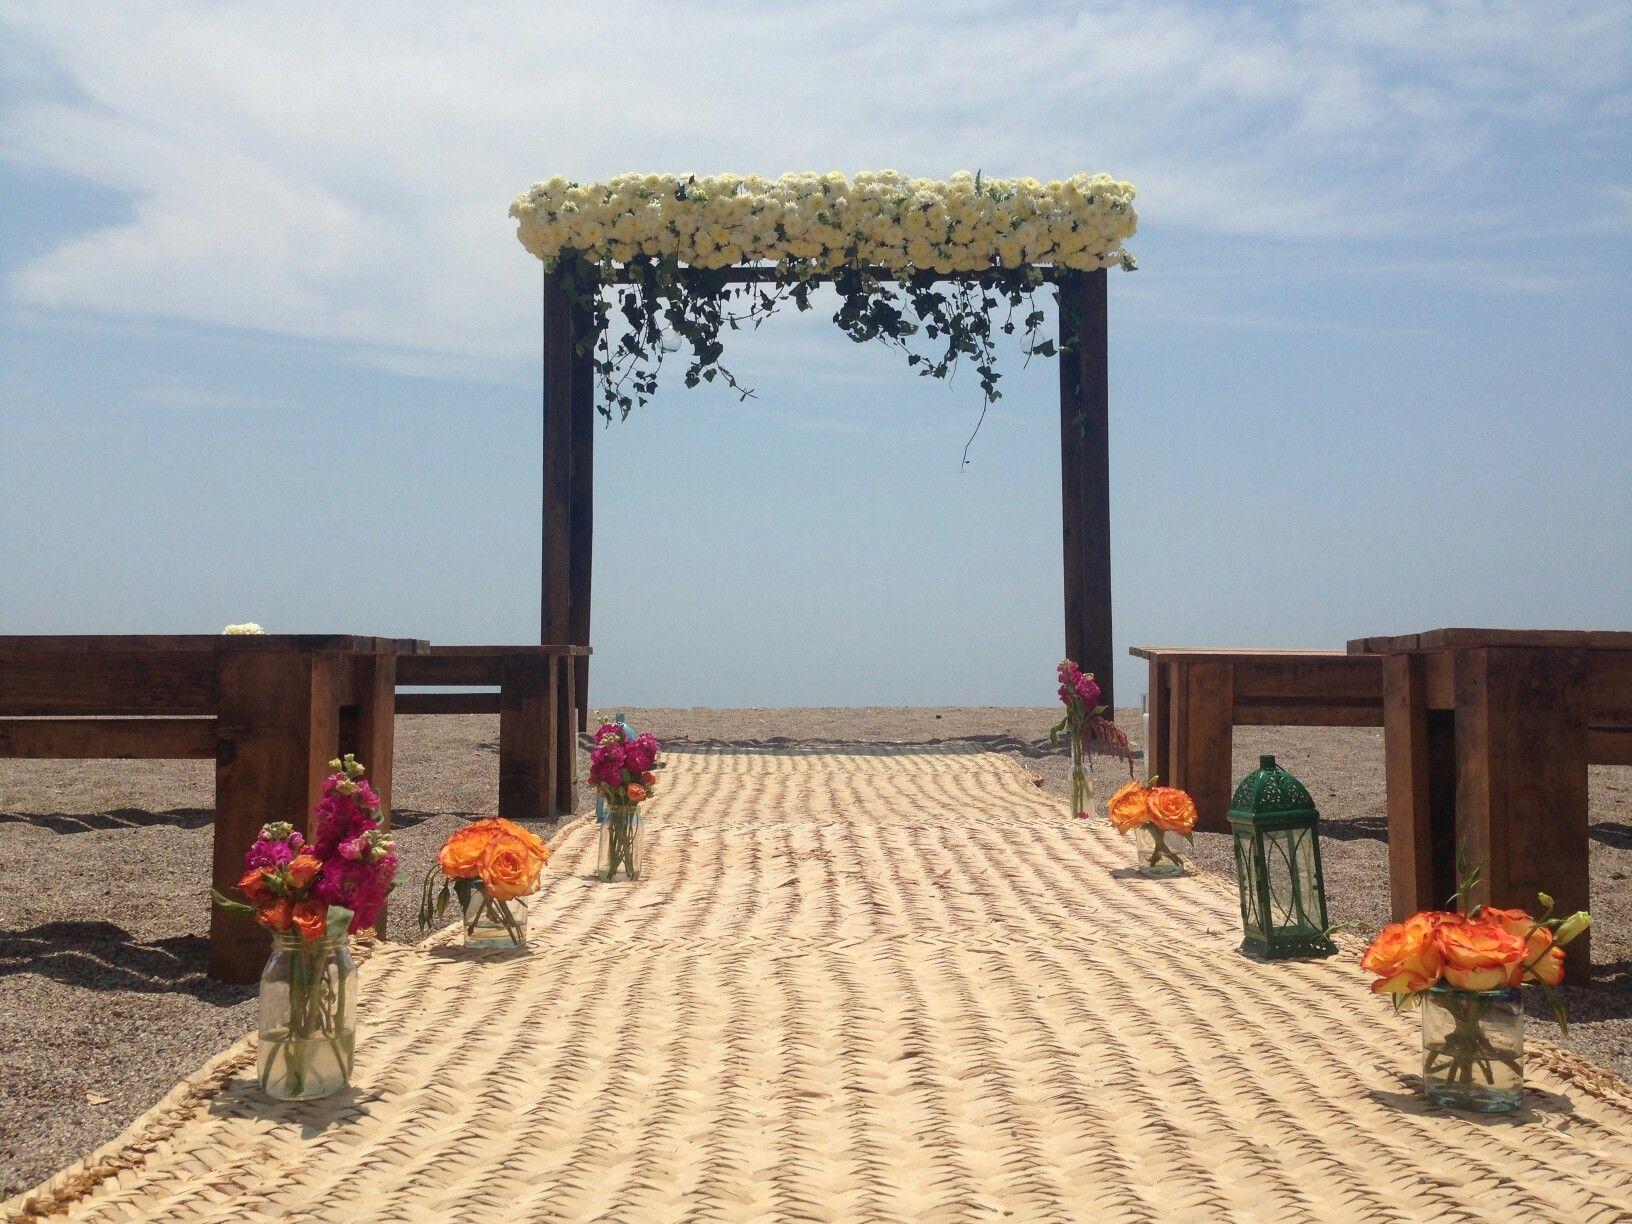 Beach Ceremony At Puerto Vallarta With @mobva.mobiliario